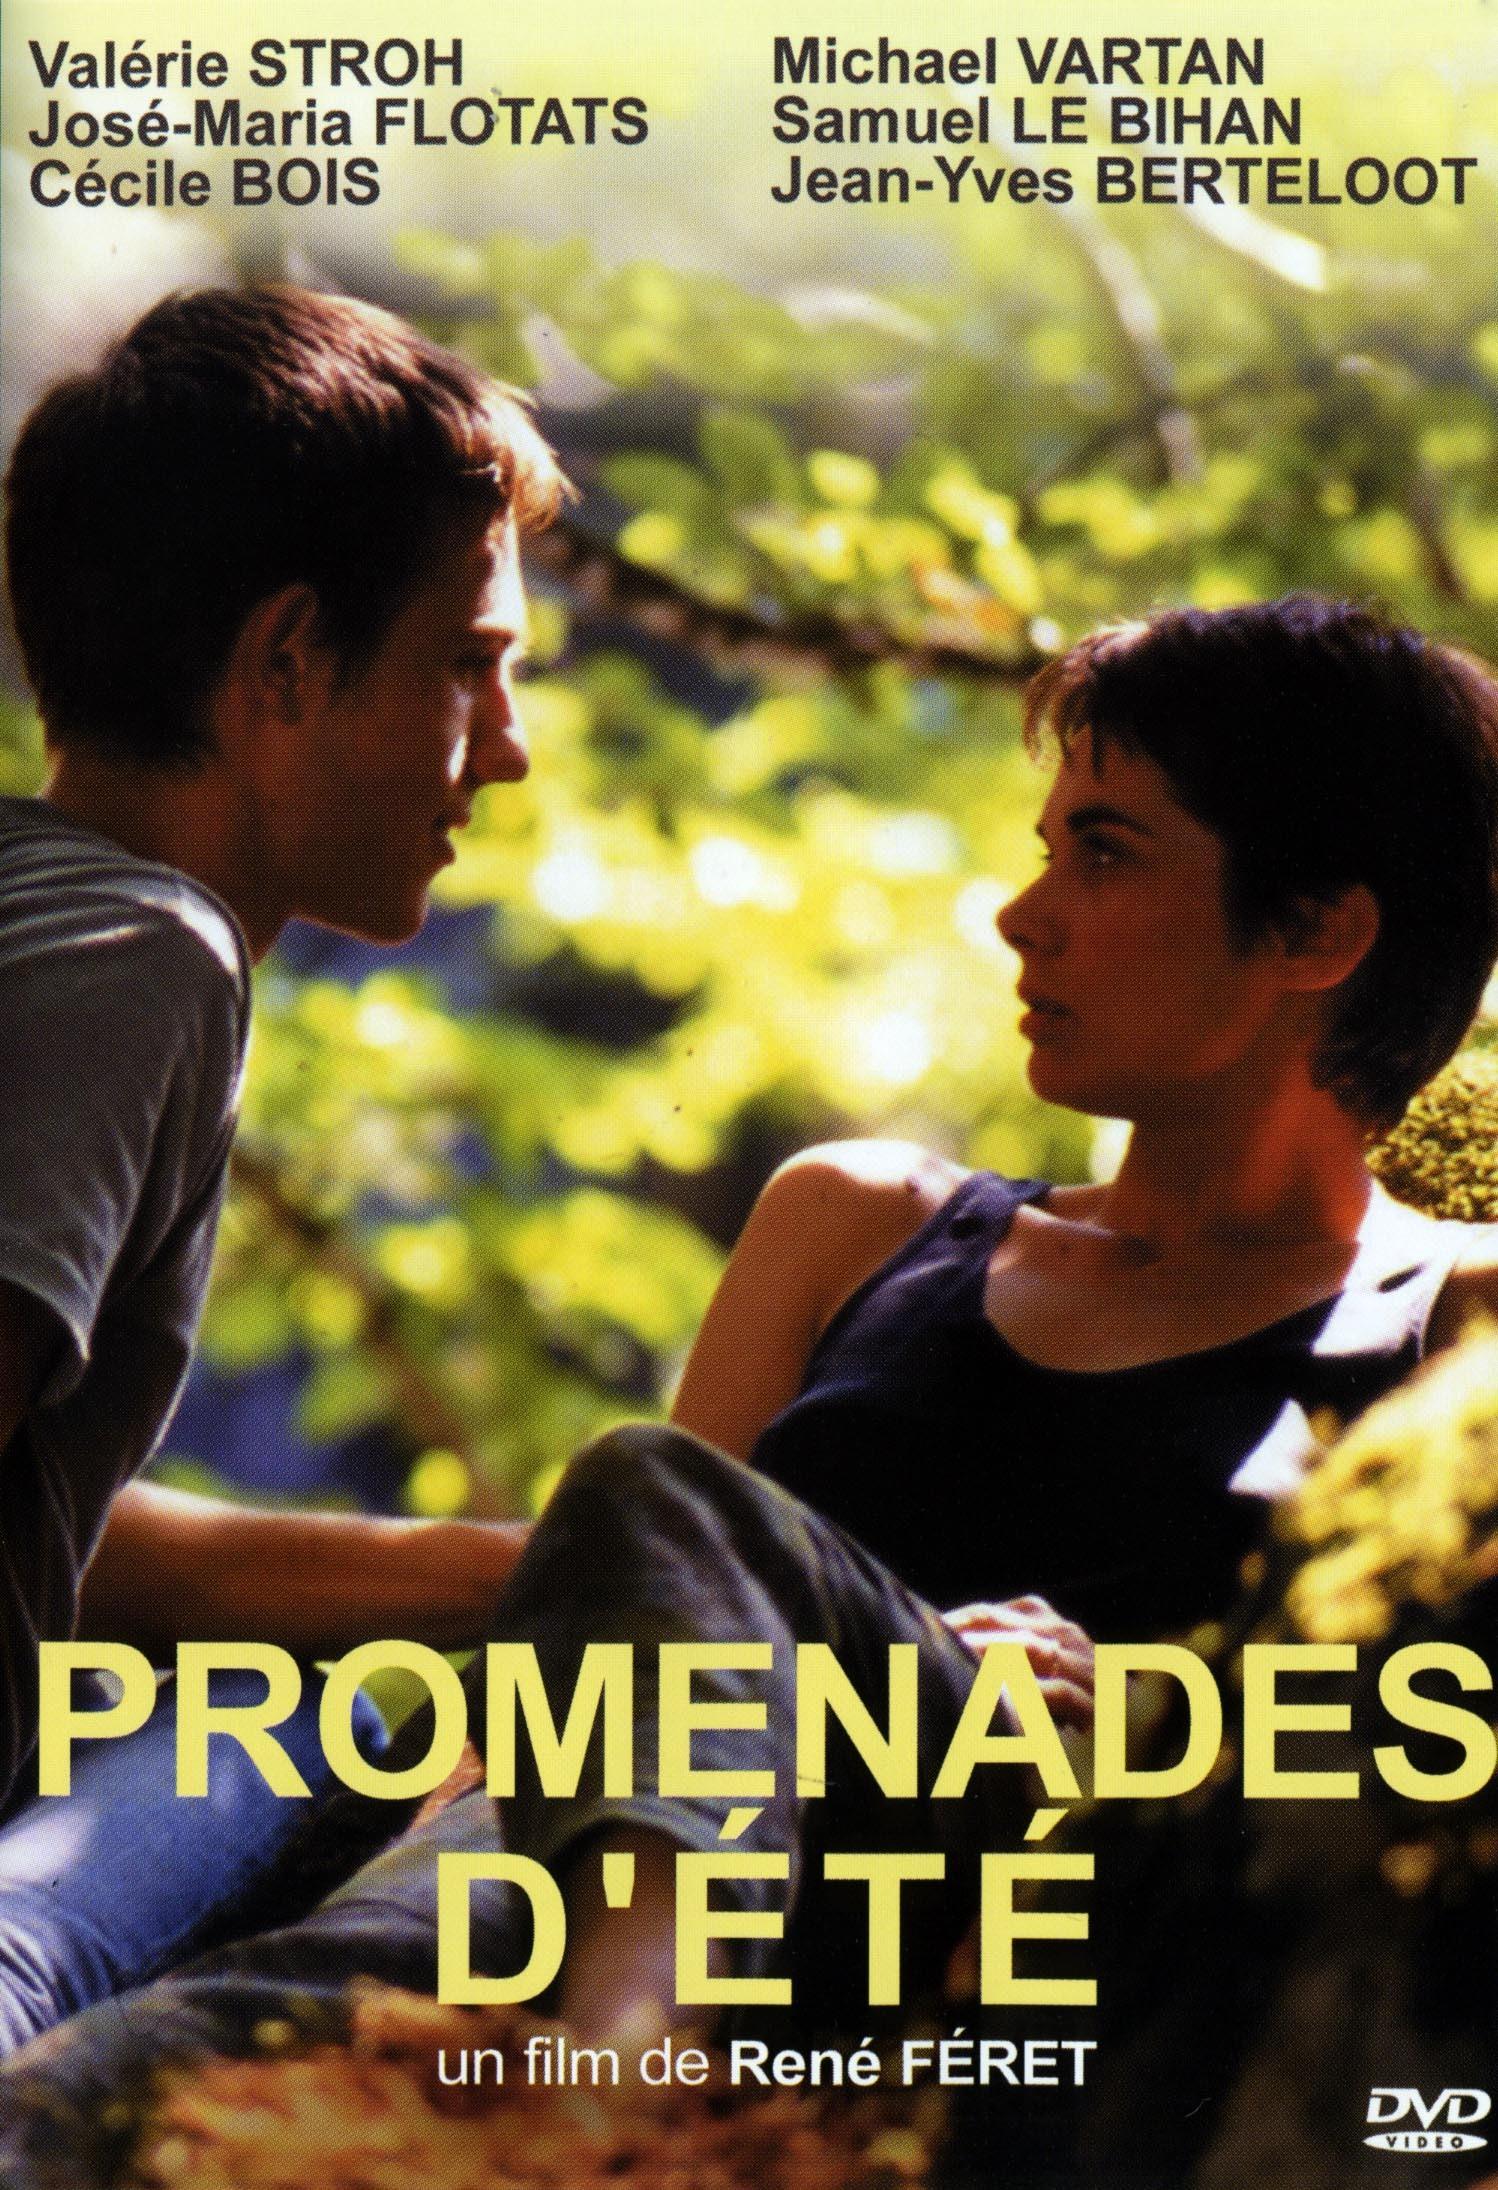 PROMENADES D'ETE - DVD